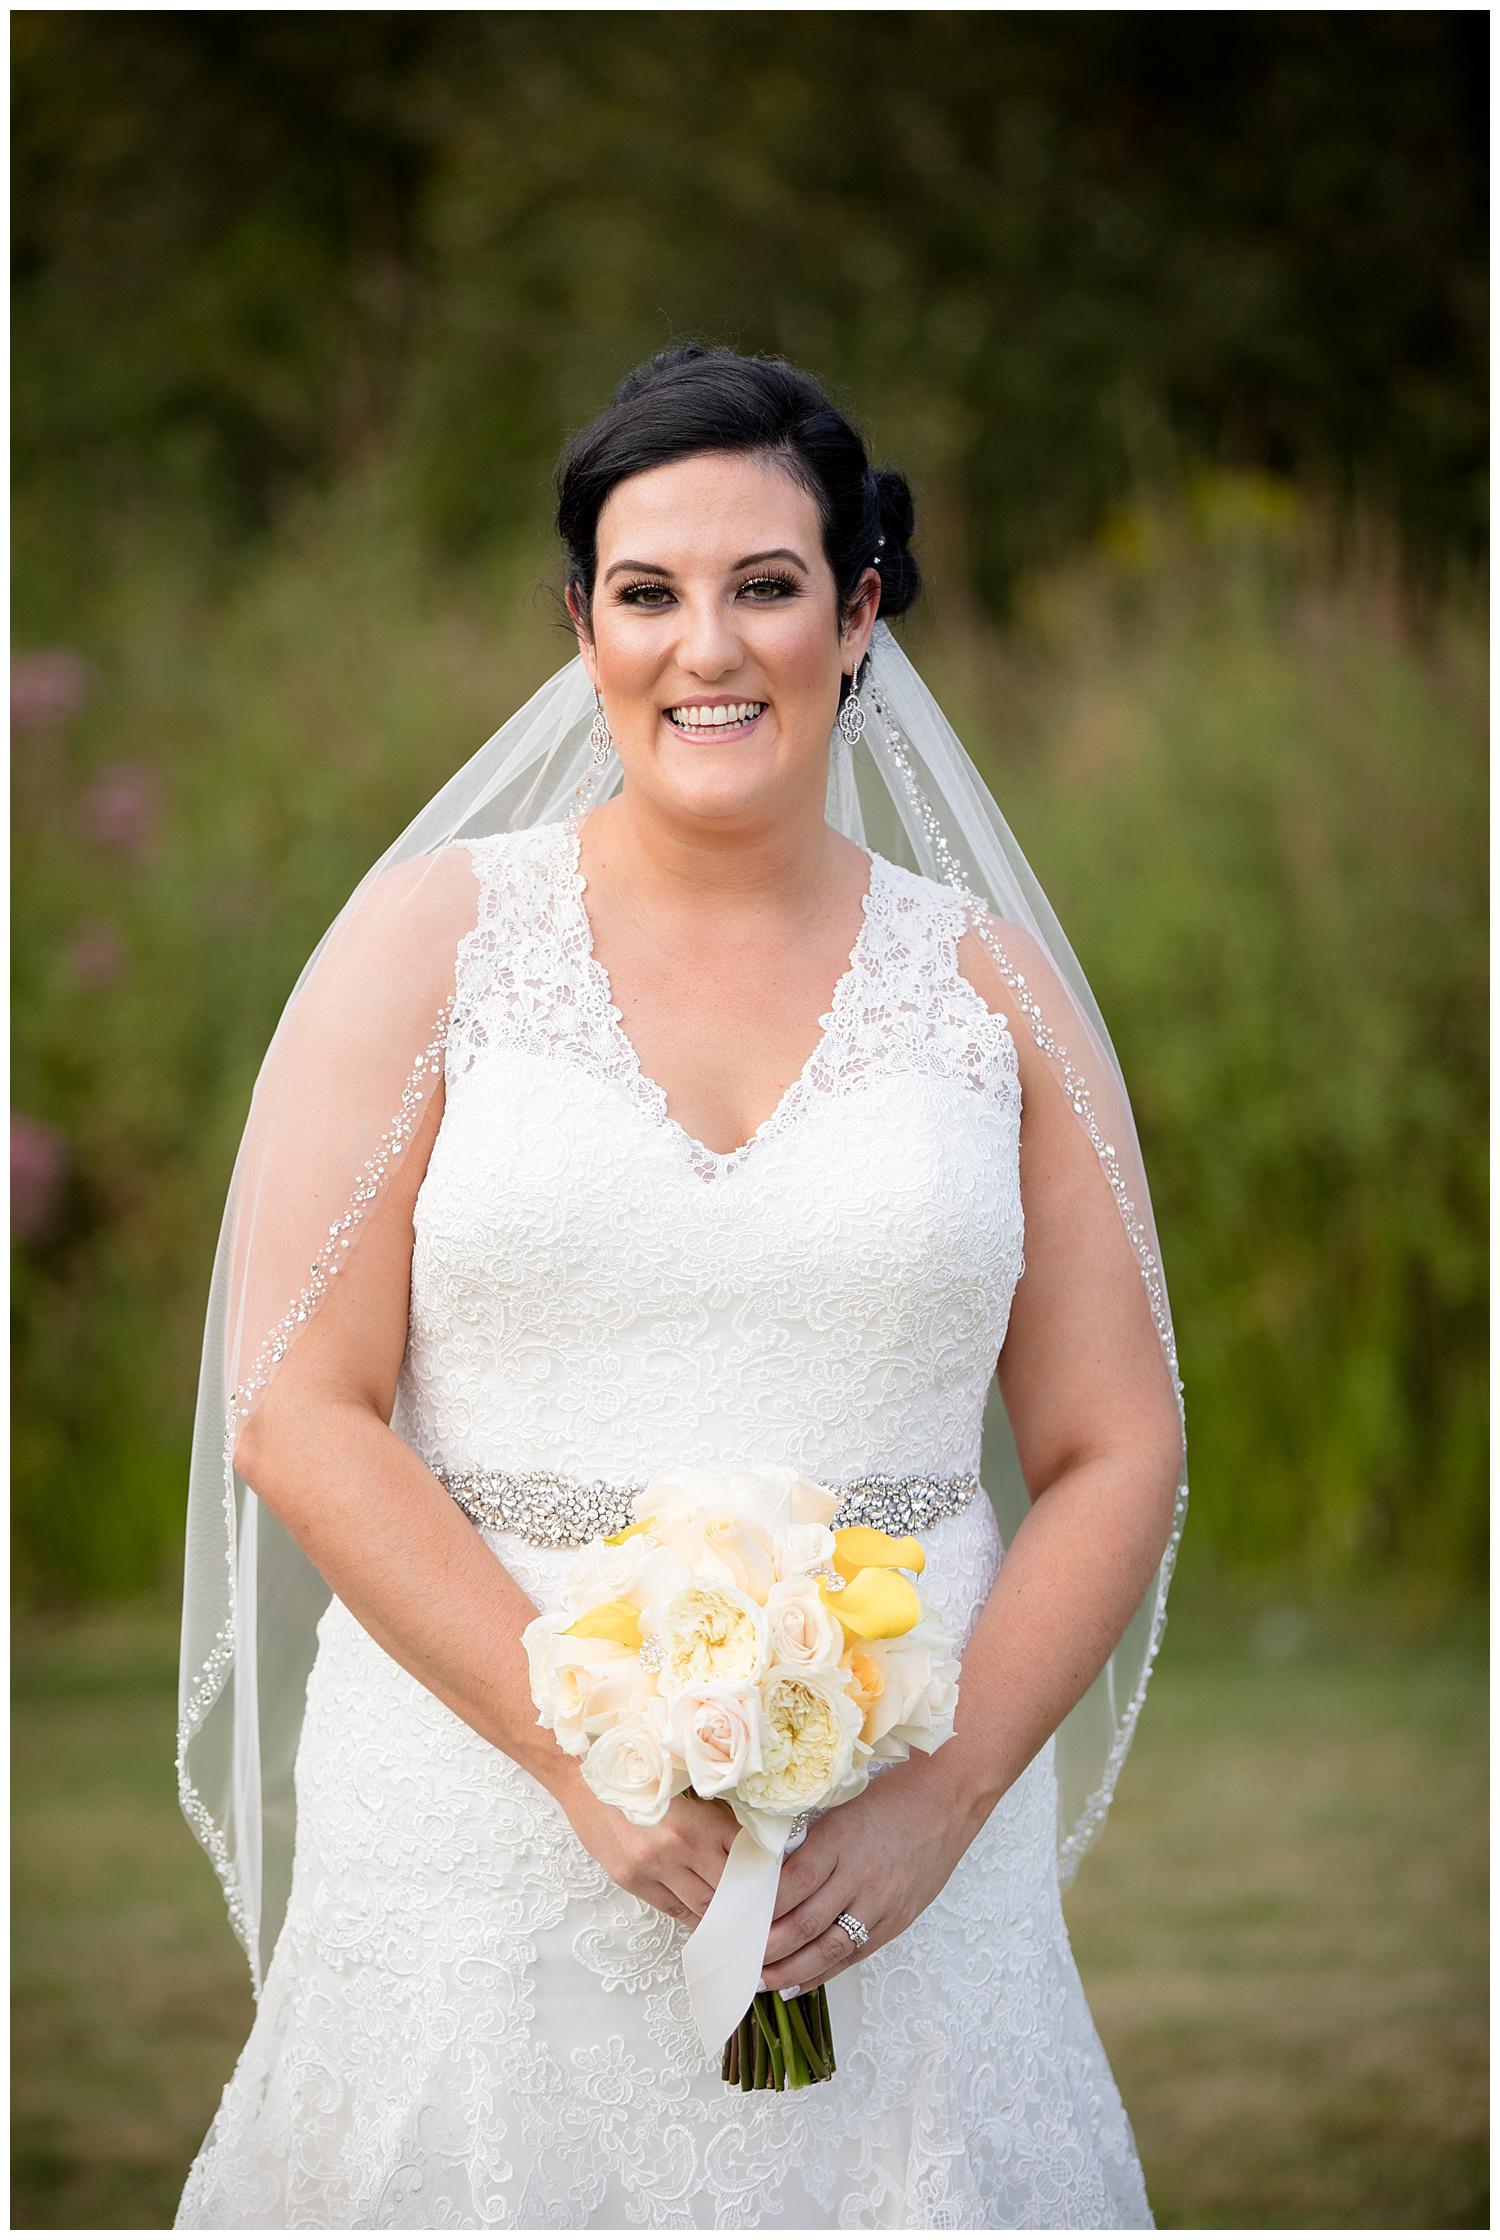 Hillside-Country-Club-Wedding-Photography-26-North-Studios-028.j